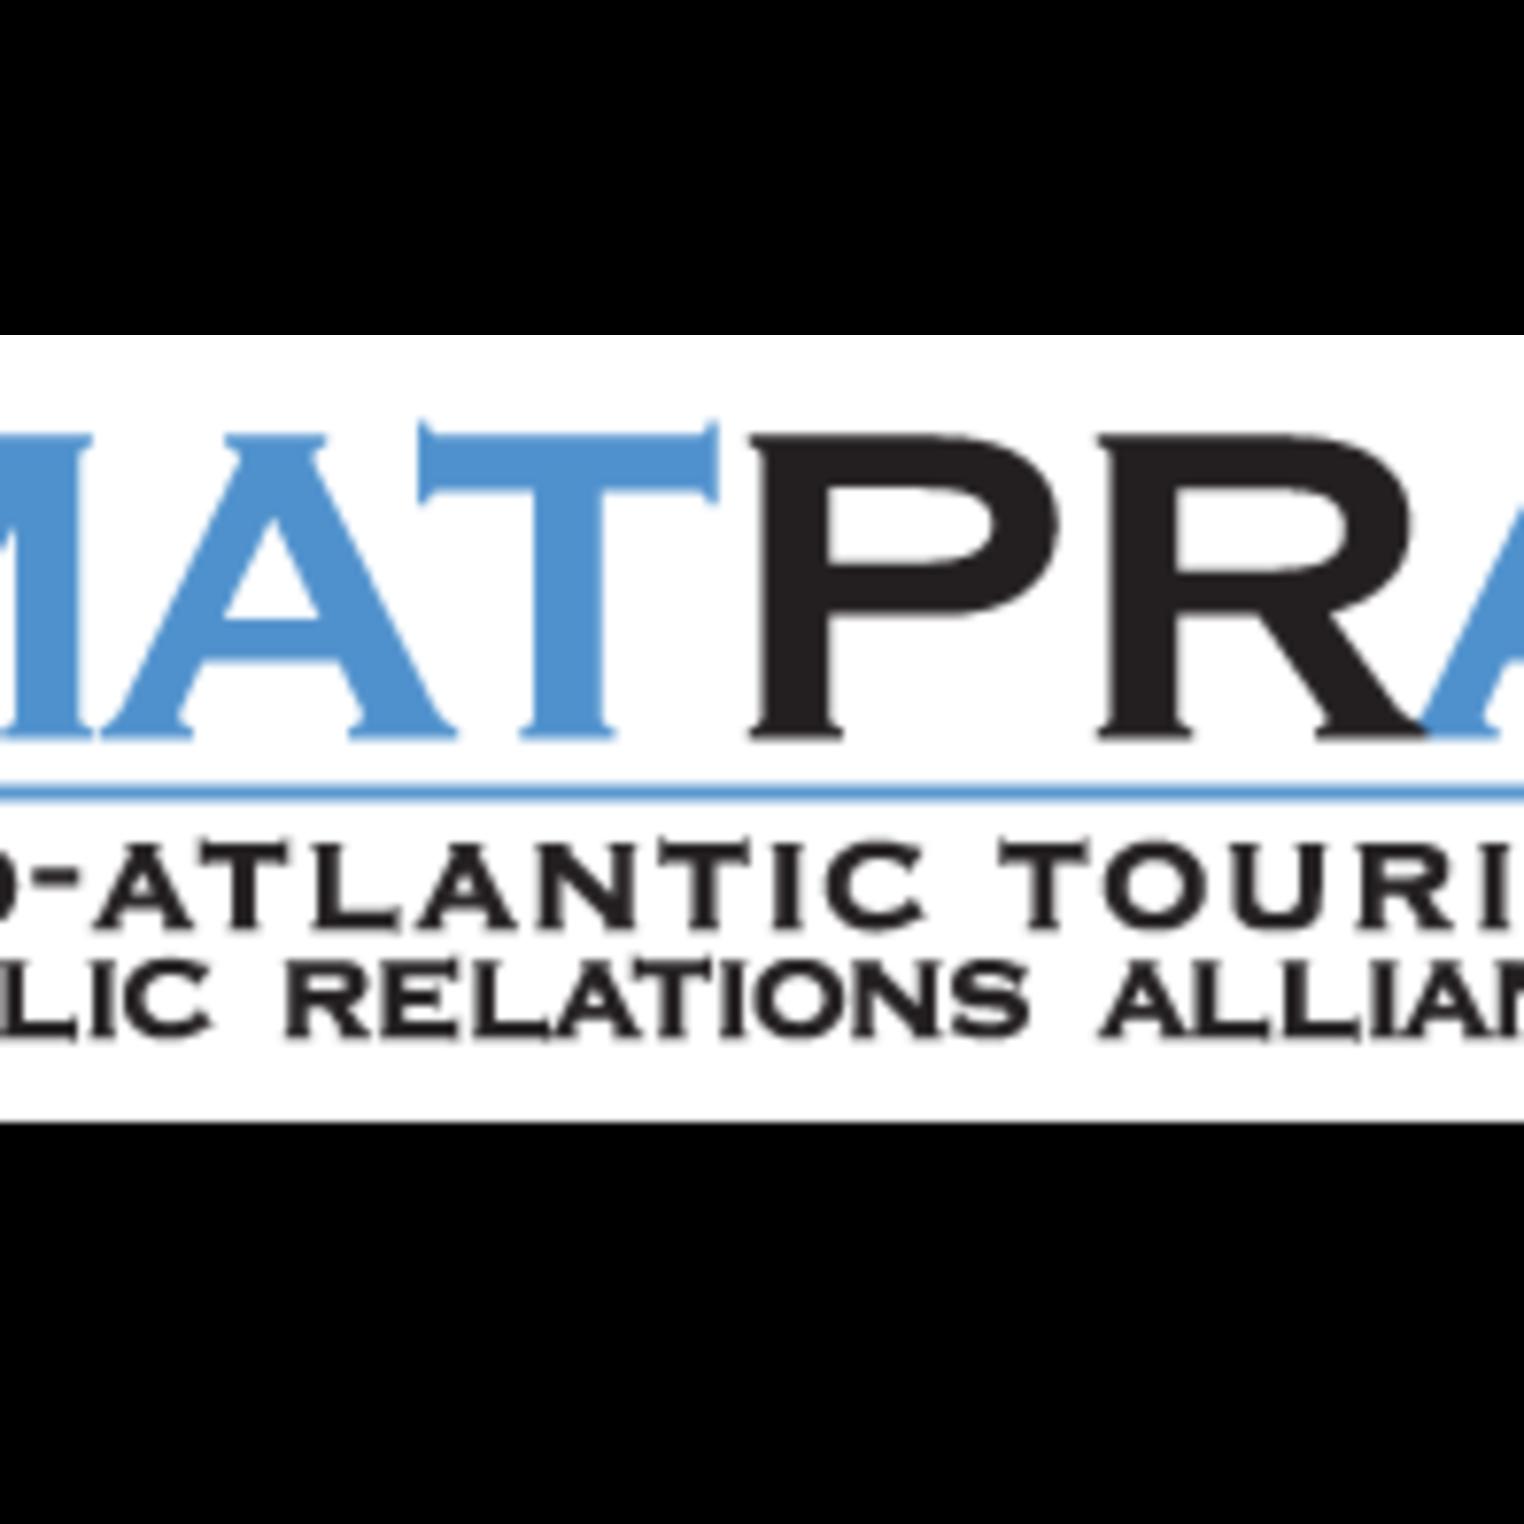 Mid-Atlantic Tourism Public Relations Alliance